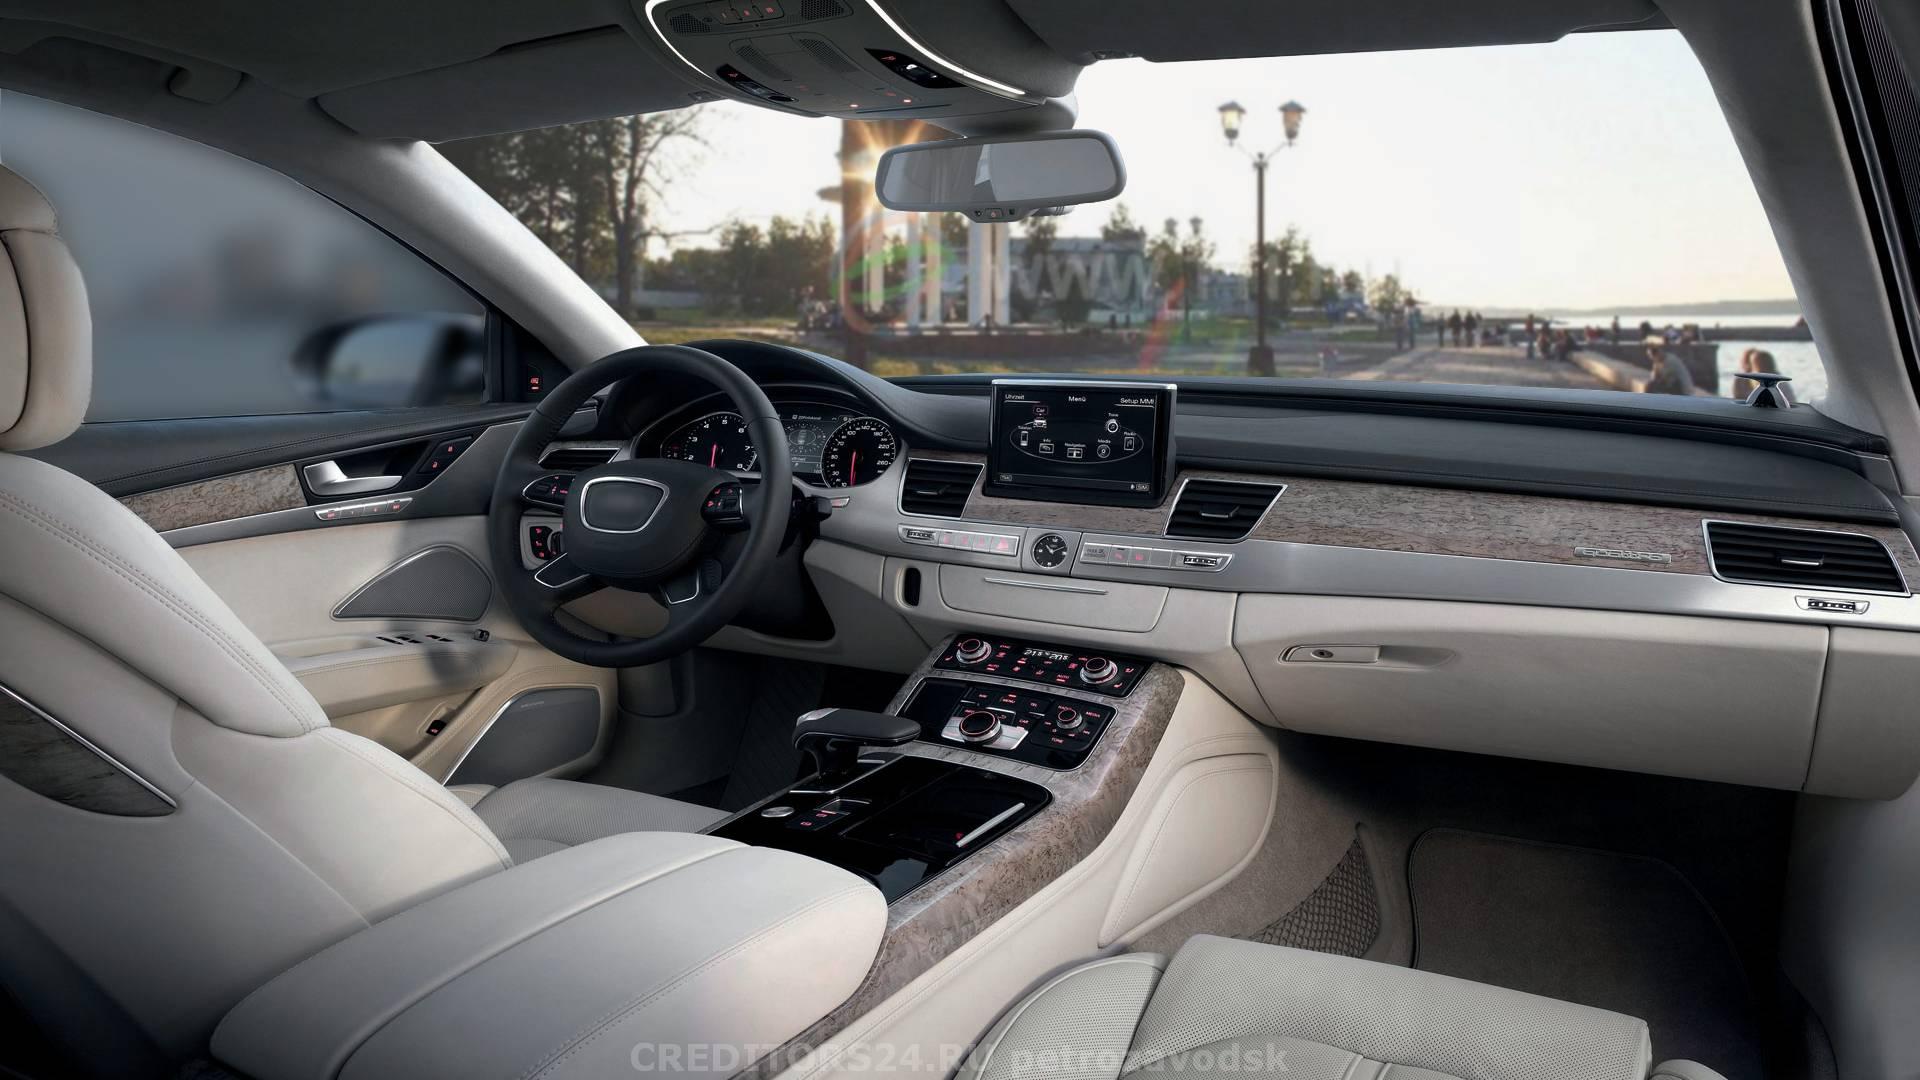 Залог на авто петрозаводск купить автомобиль бу в ломбарде